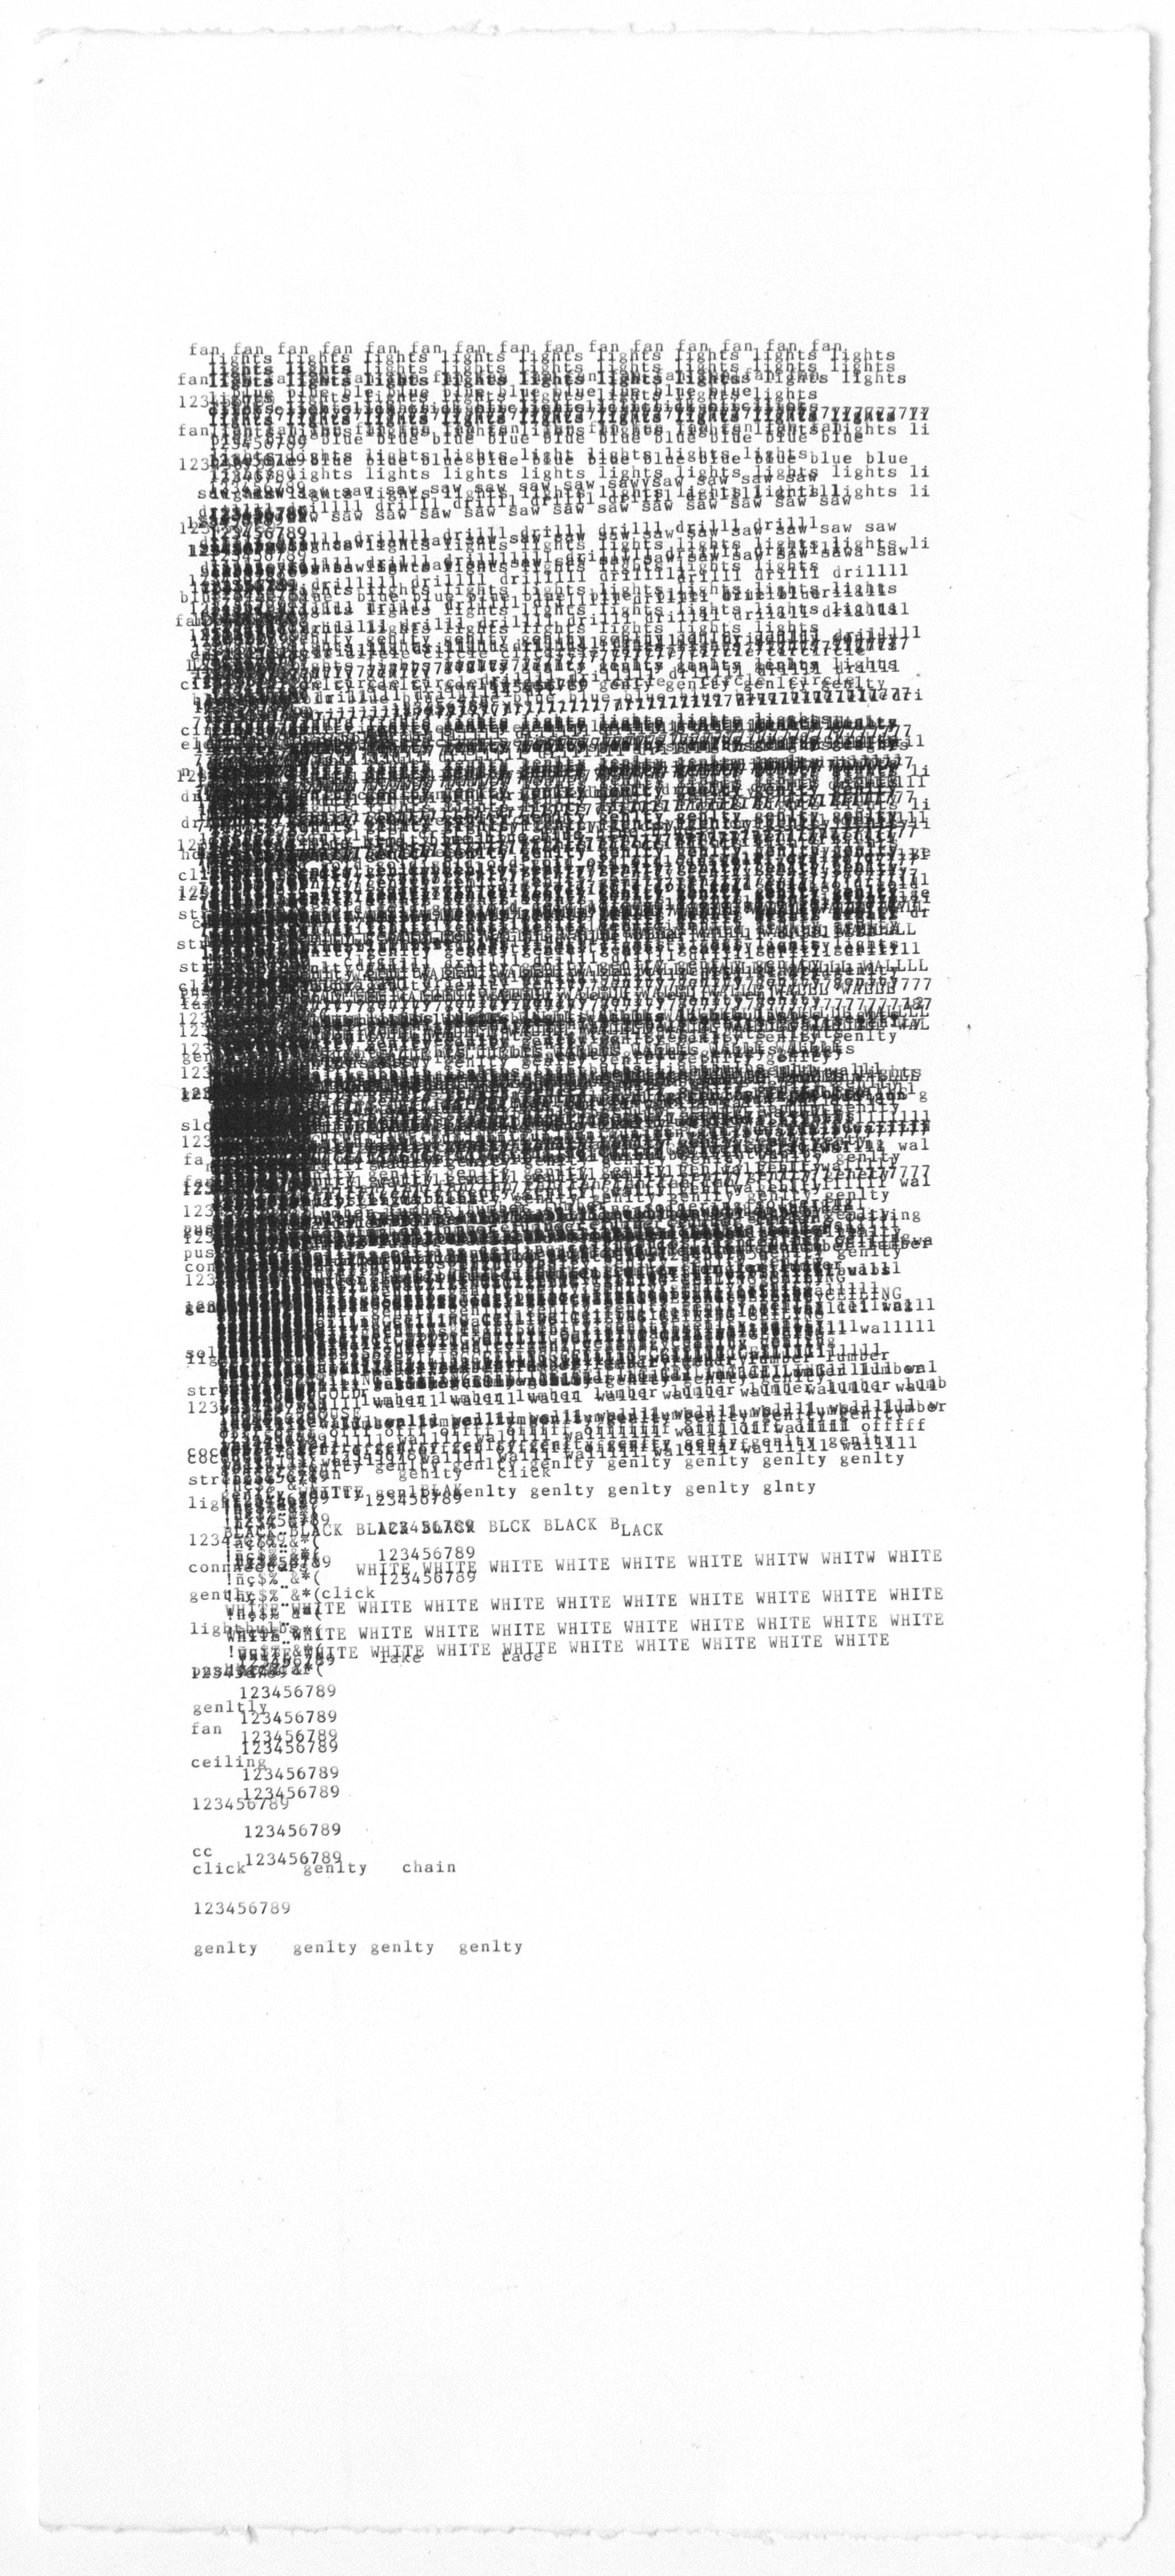 Dan Miller, Untitled (DM 988), 2018, 10 x 22.5 inches